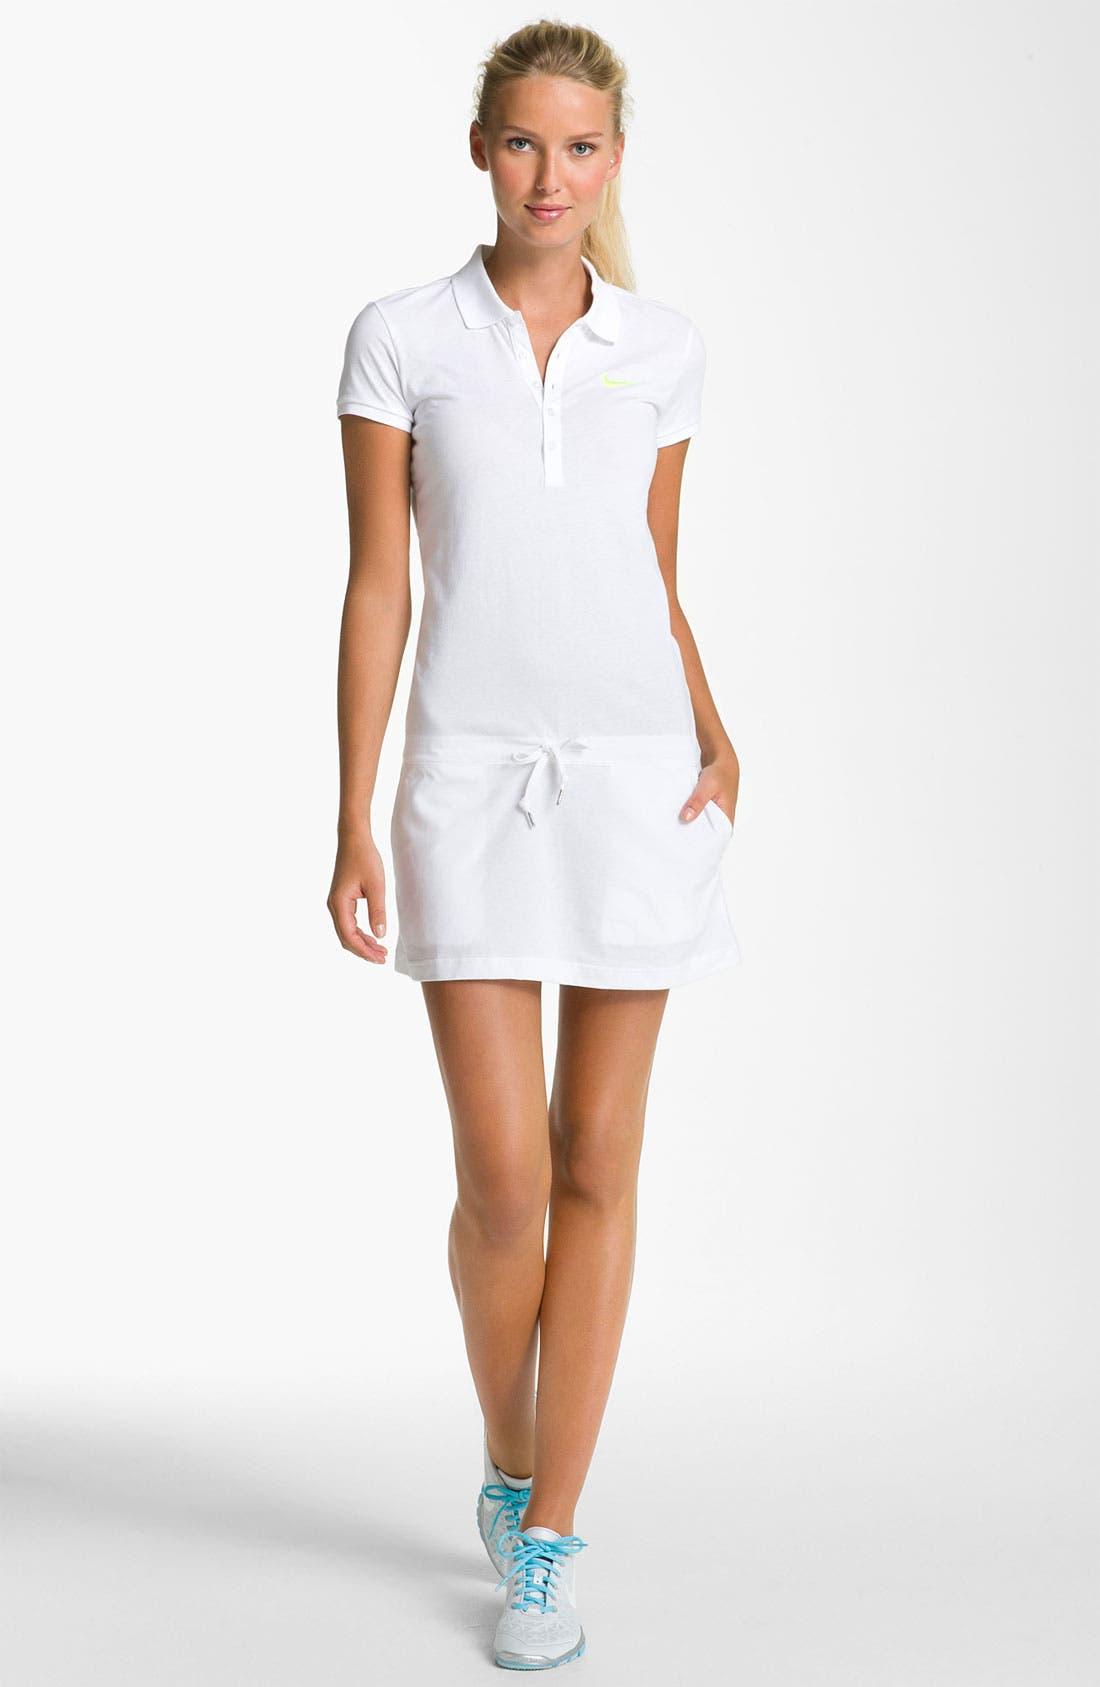 Main Image - Nike 'AD' Polo Dress